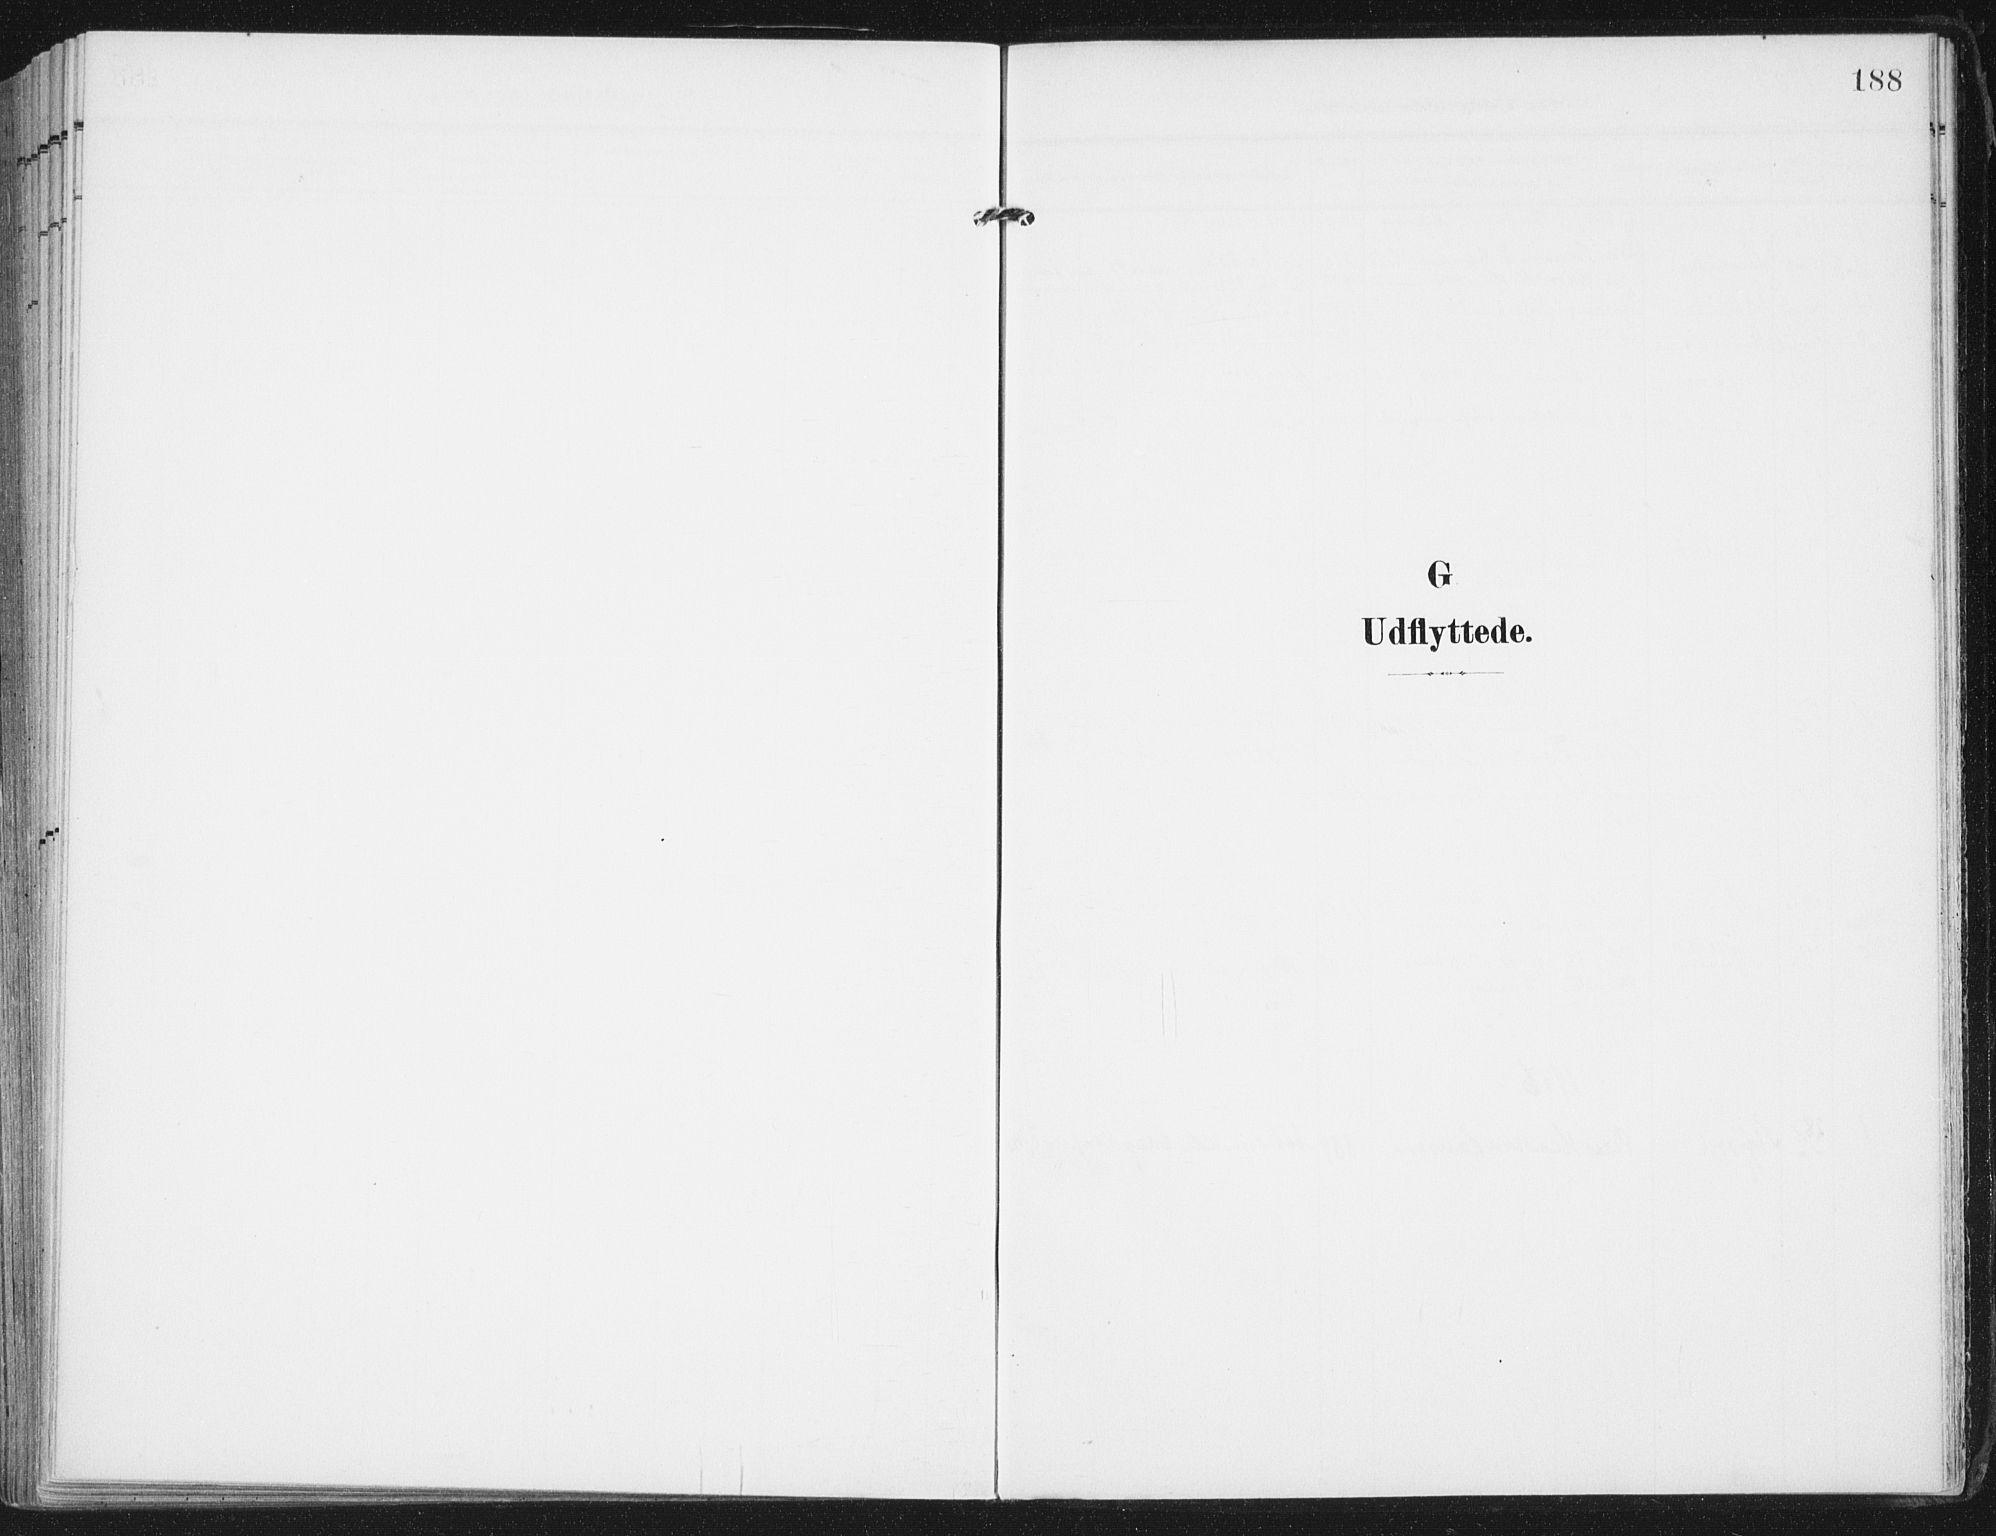 SAT, Ministerialprotokoller, klokkerbøker og fødselsregistre - Nordland, 892/L1321: Ministerialbok nr. 892A02, 1902-1918, s. 188